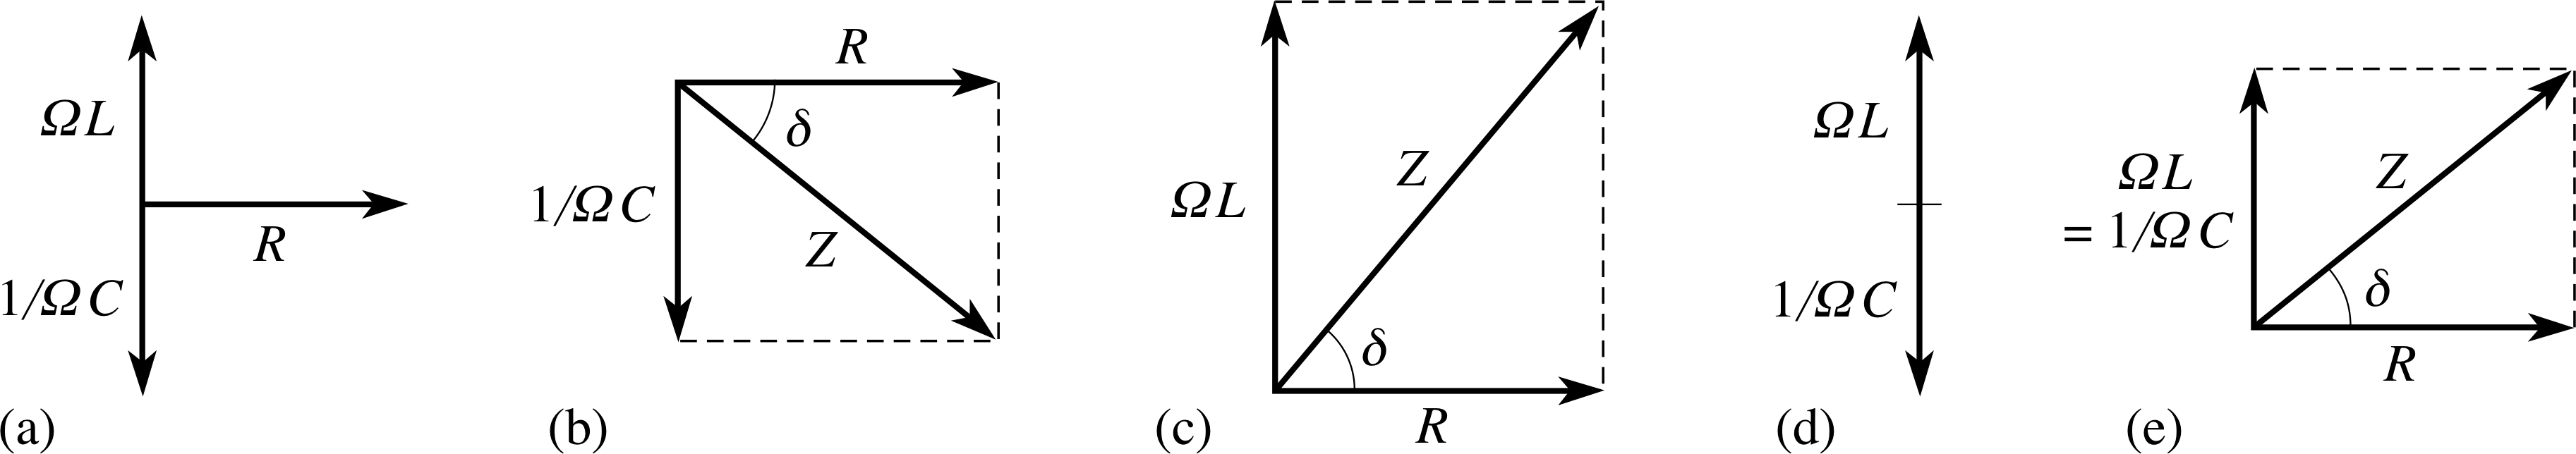 PPLATO | FLAP | PHYS 5 5: The mathematics of oscillations